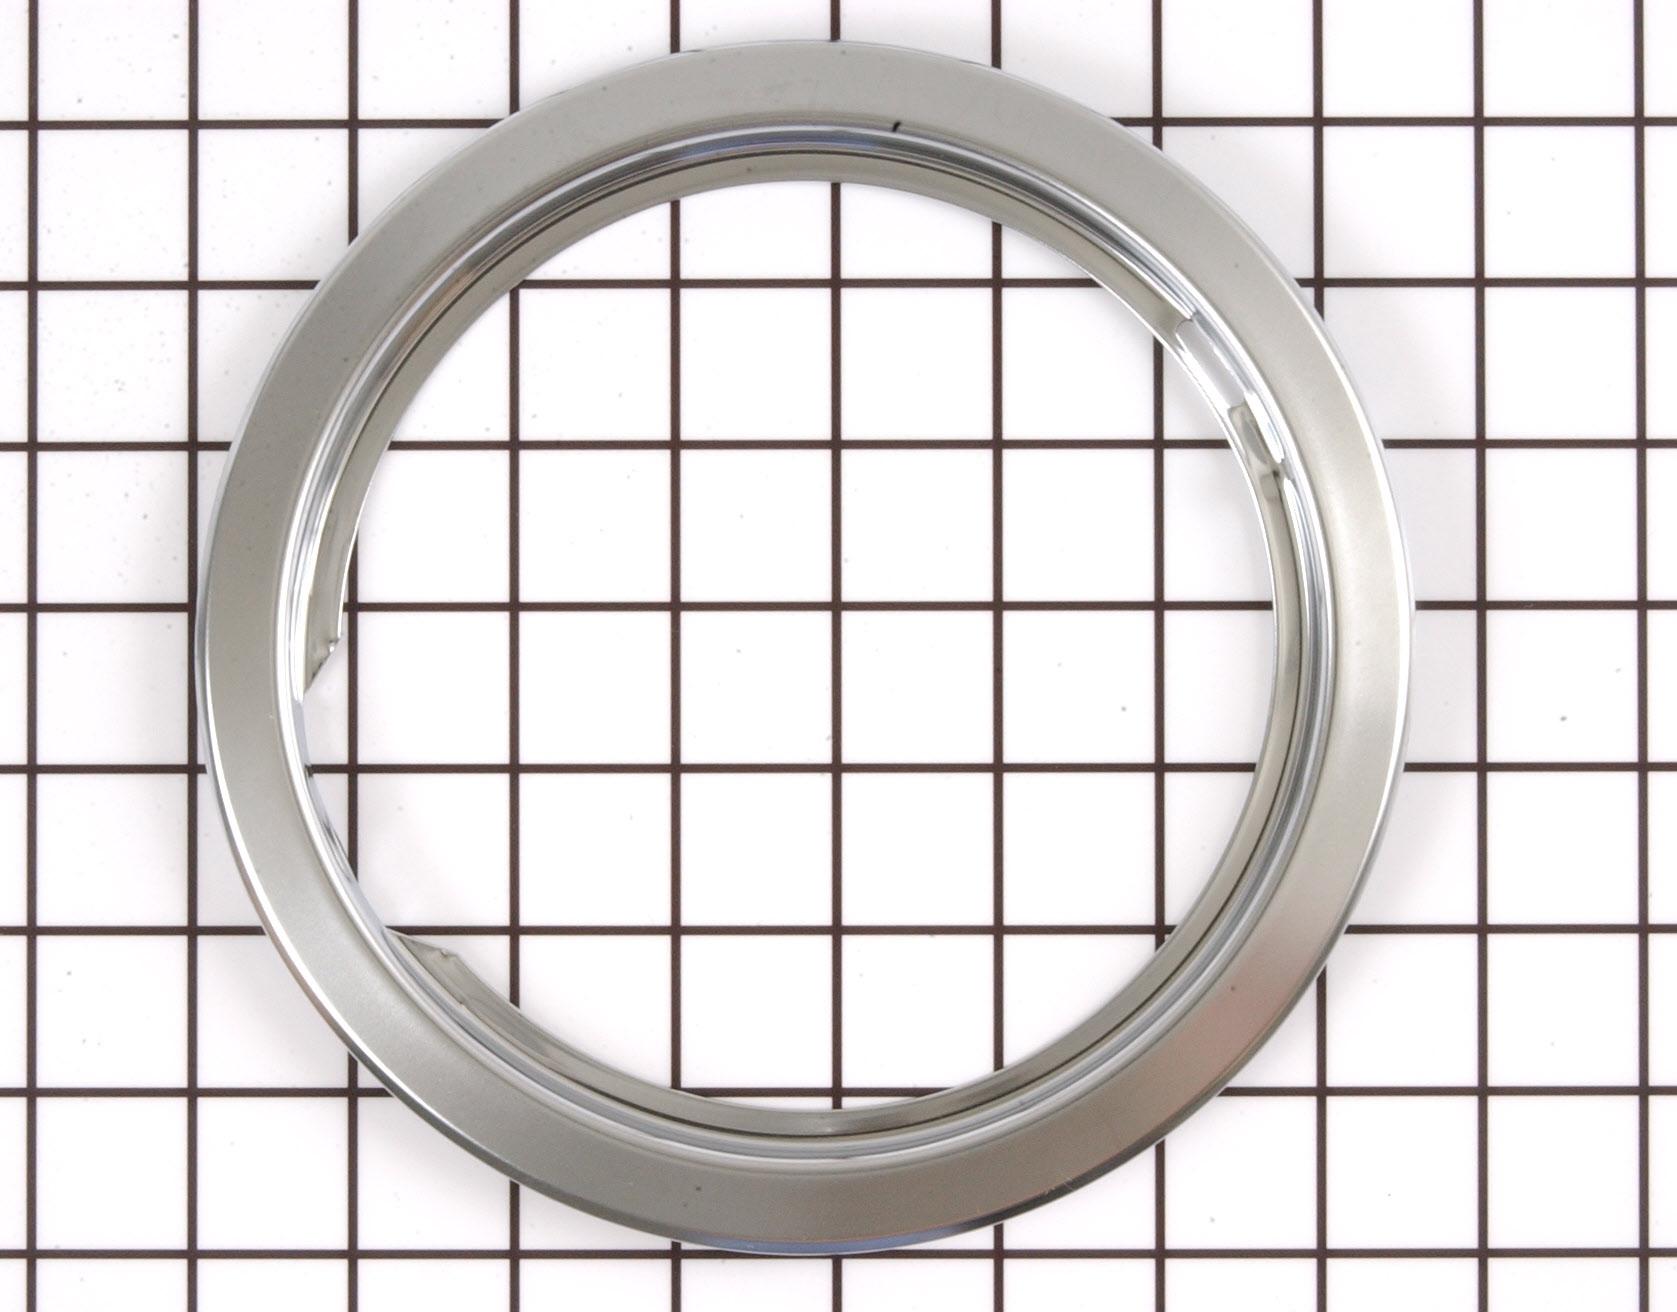 19950050 Crosley Range Stove Oven Part -6 Inch Burner Trim Ring